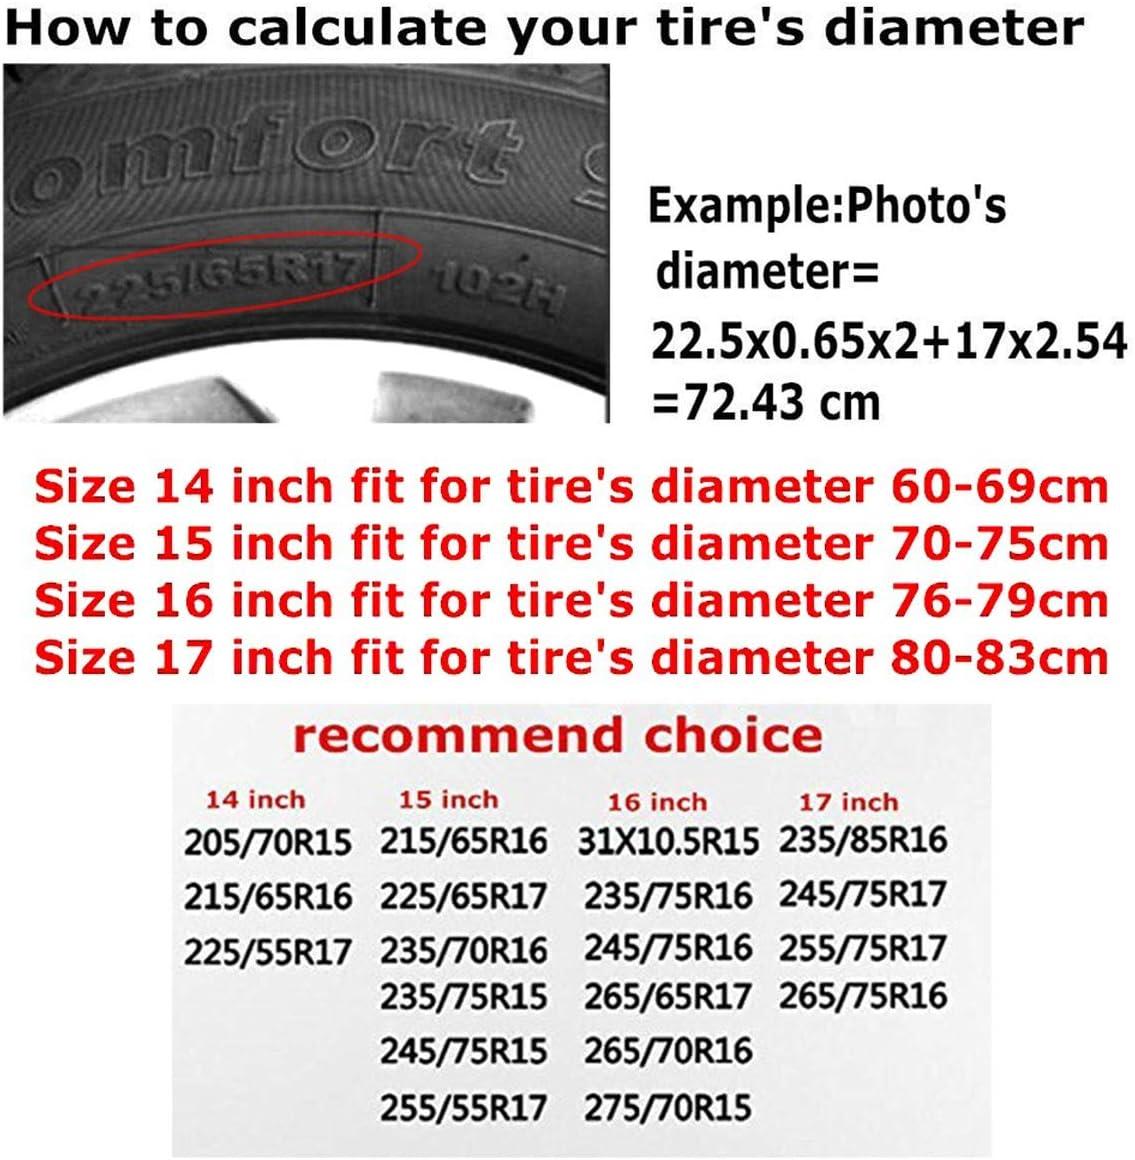 LMHBLTOP Classic Poke Charizard Tire Cover Multifunction Spare Tire Cover Wheel Covers for RV,Auto Truck,Car,Camper,Trailer